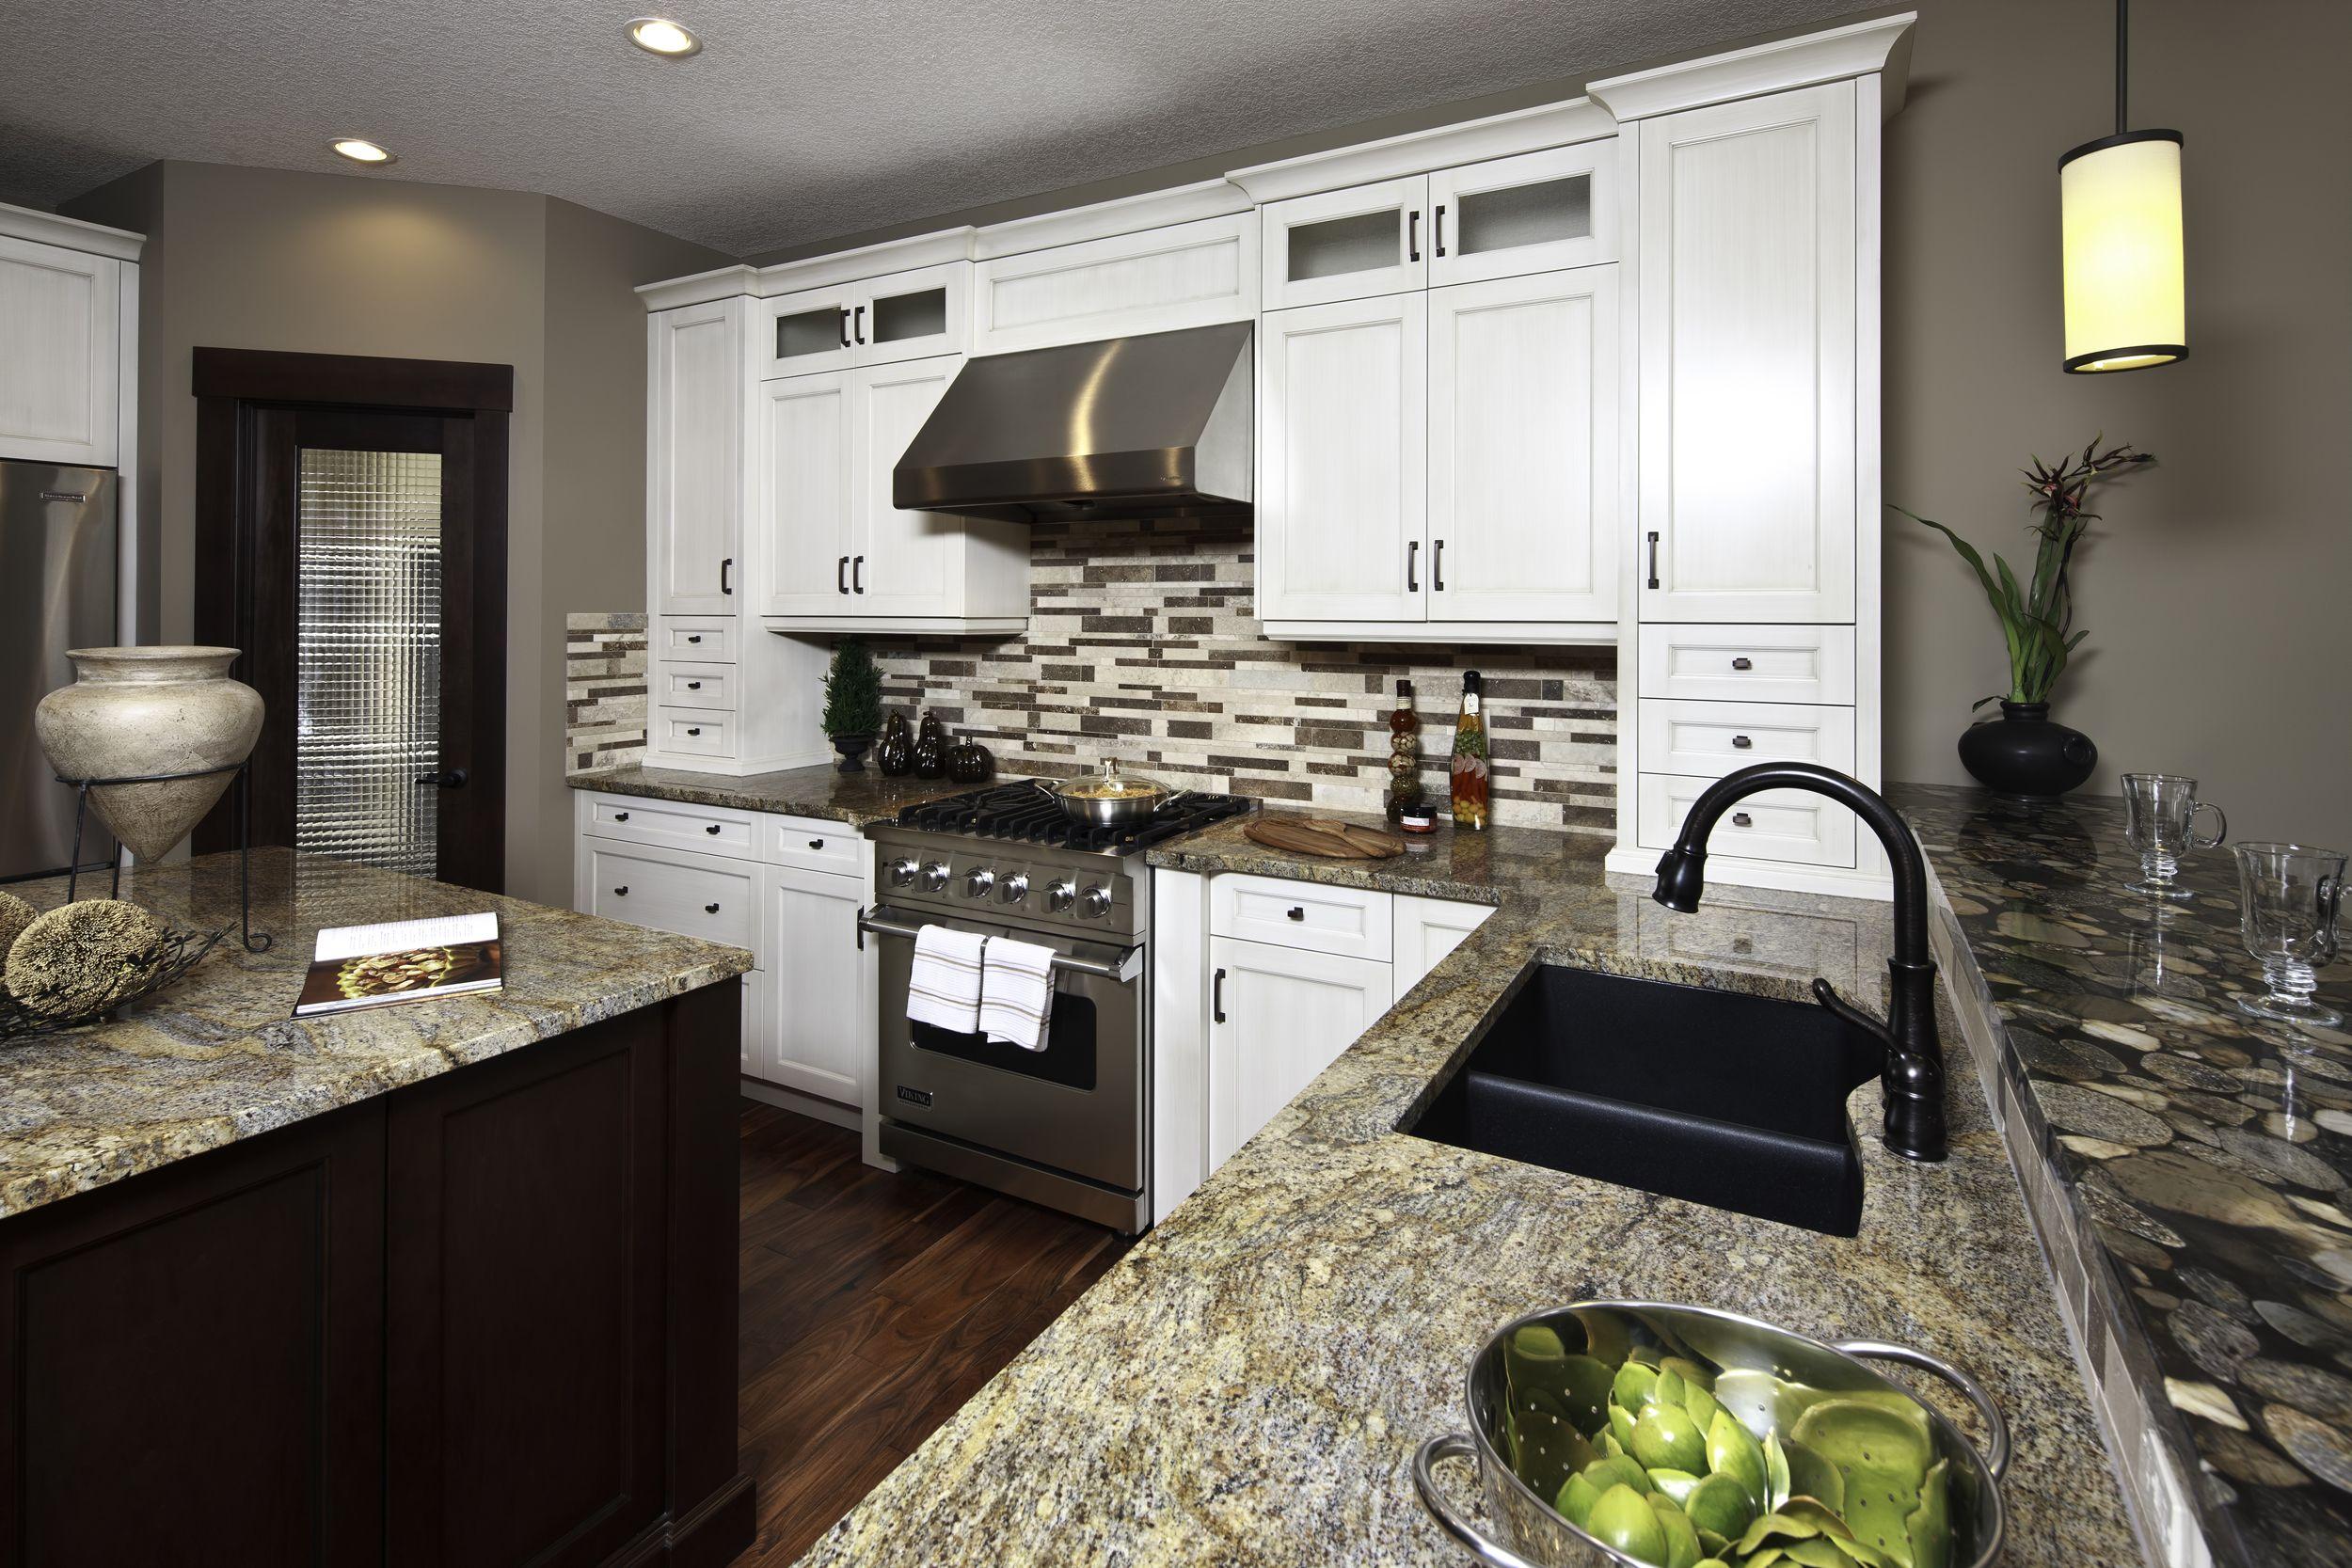 Kitchen alternate view of contrasting granite countertops